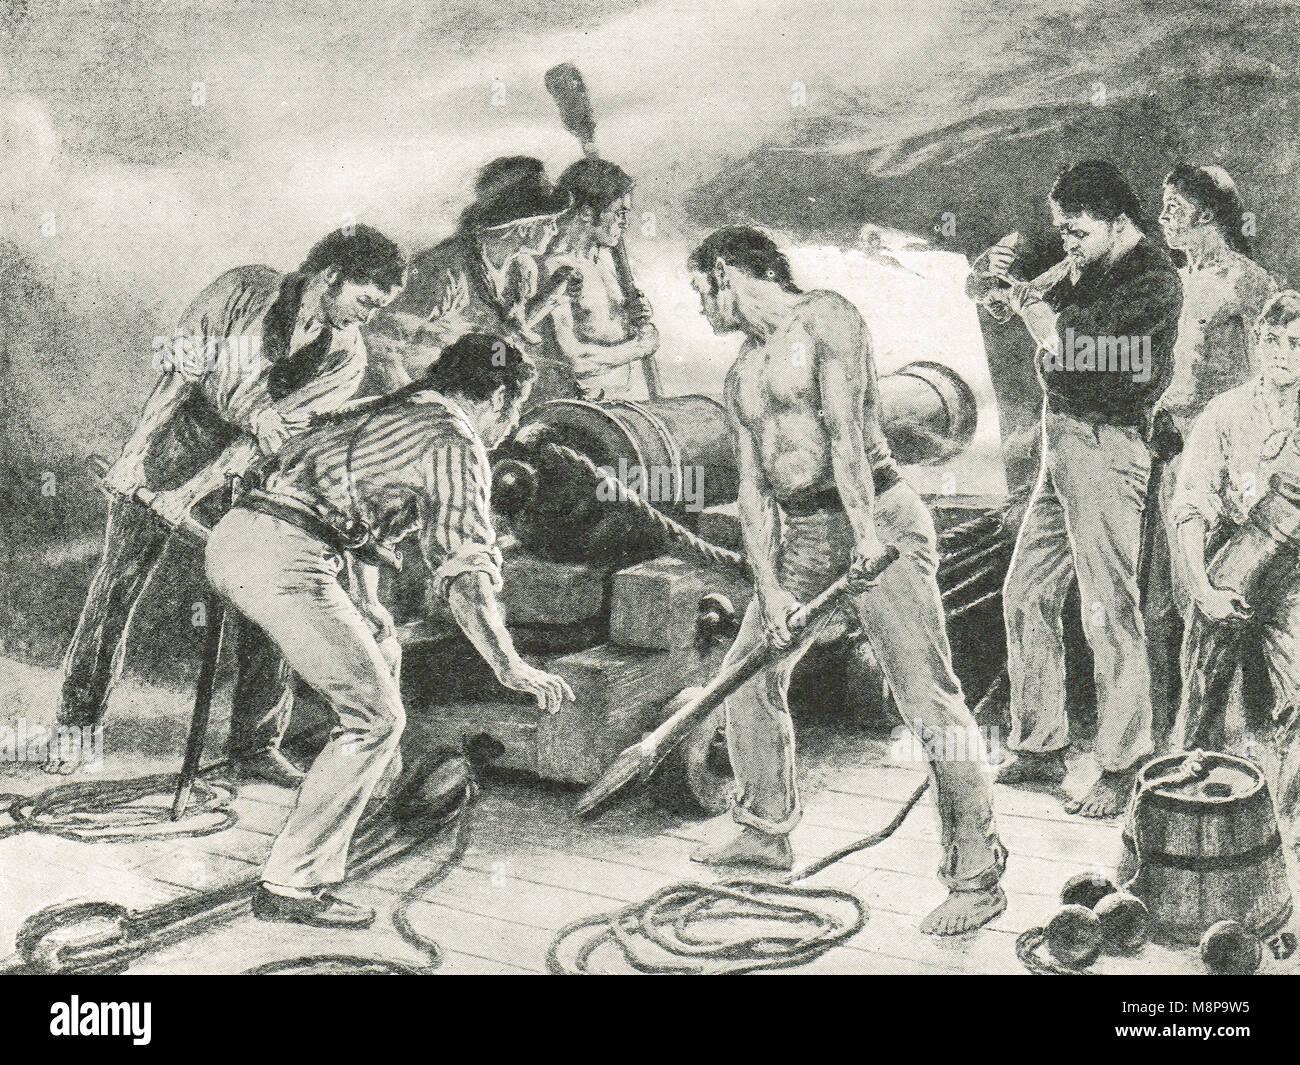 English Gunners in action, Battle of Trafalgar, 21 October, 1805 - Stock Image